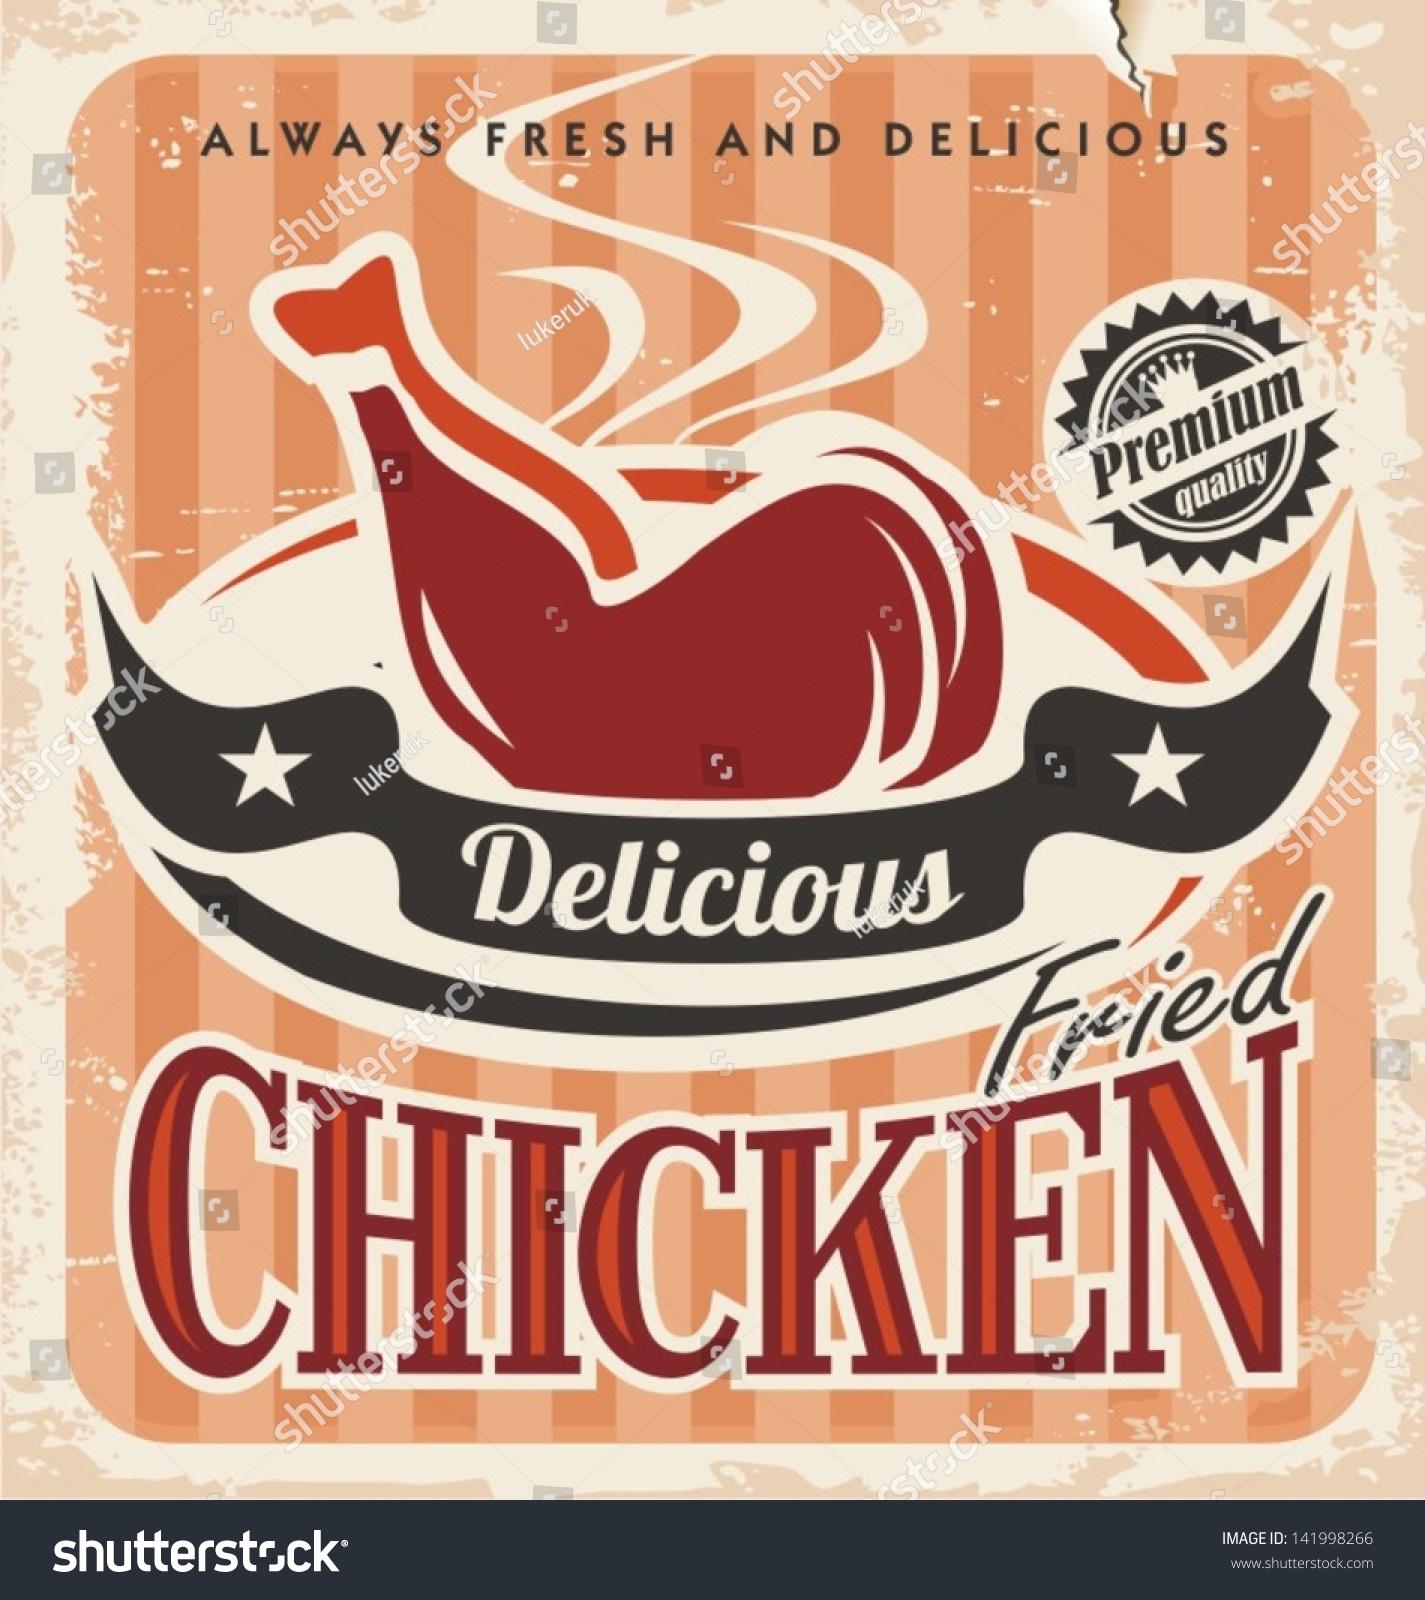 Design poster retro - Vintage Fried Chicken Vector Poster Design Retro Background Food Template